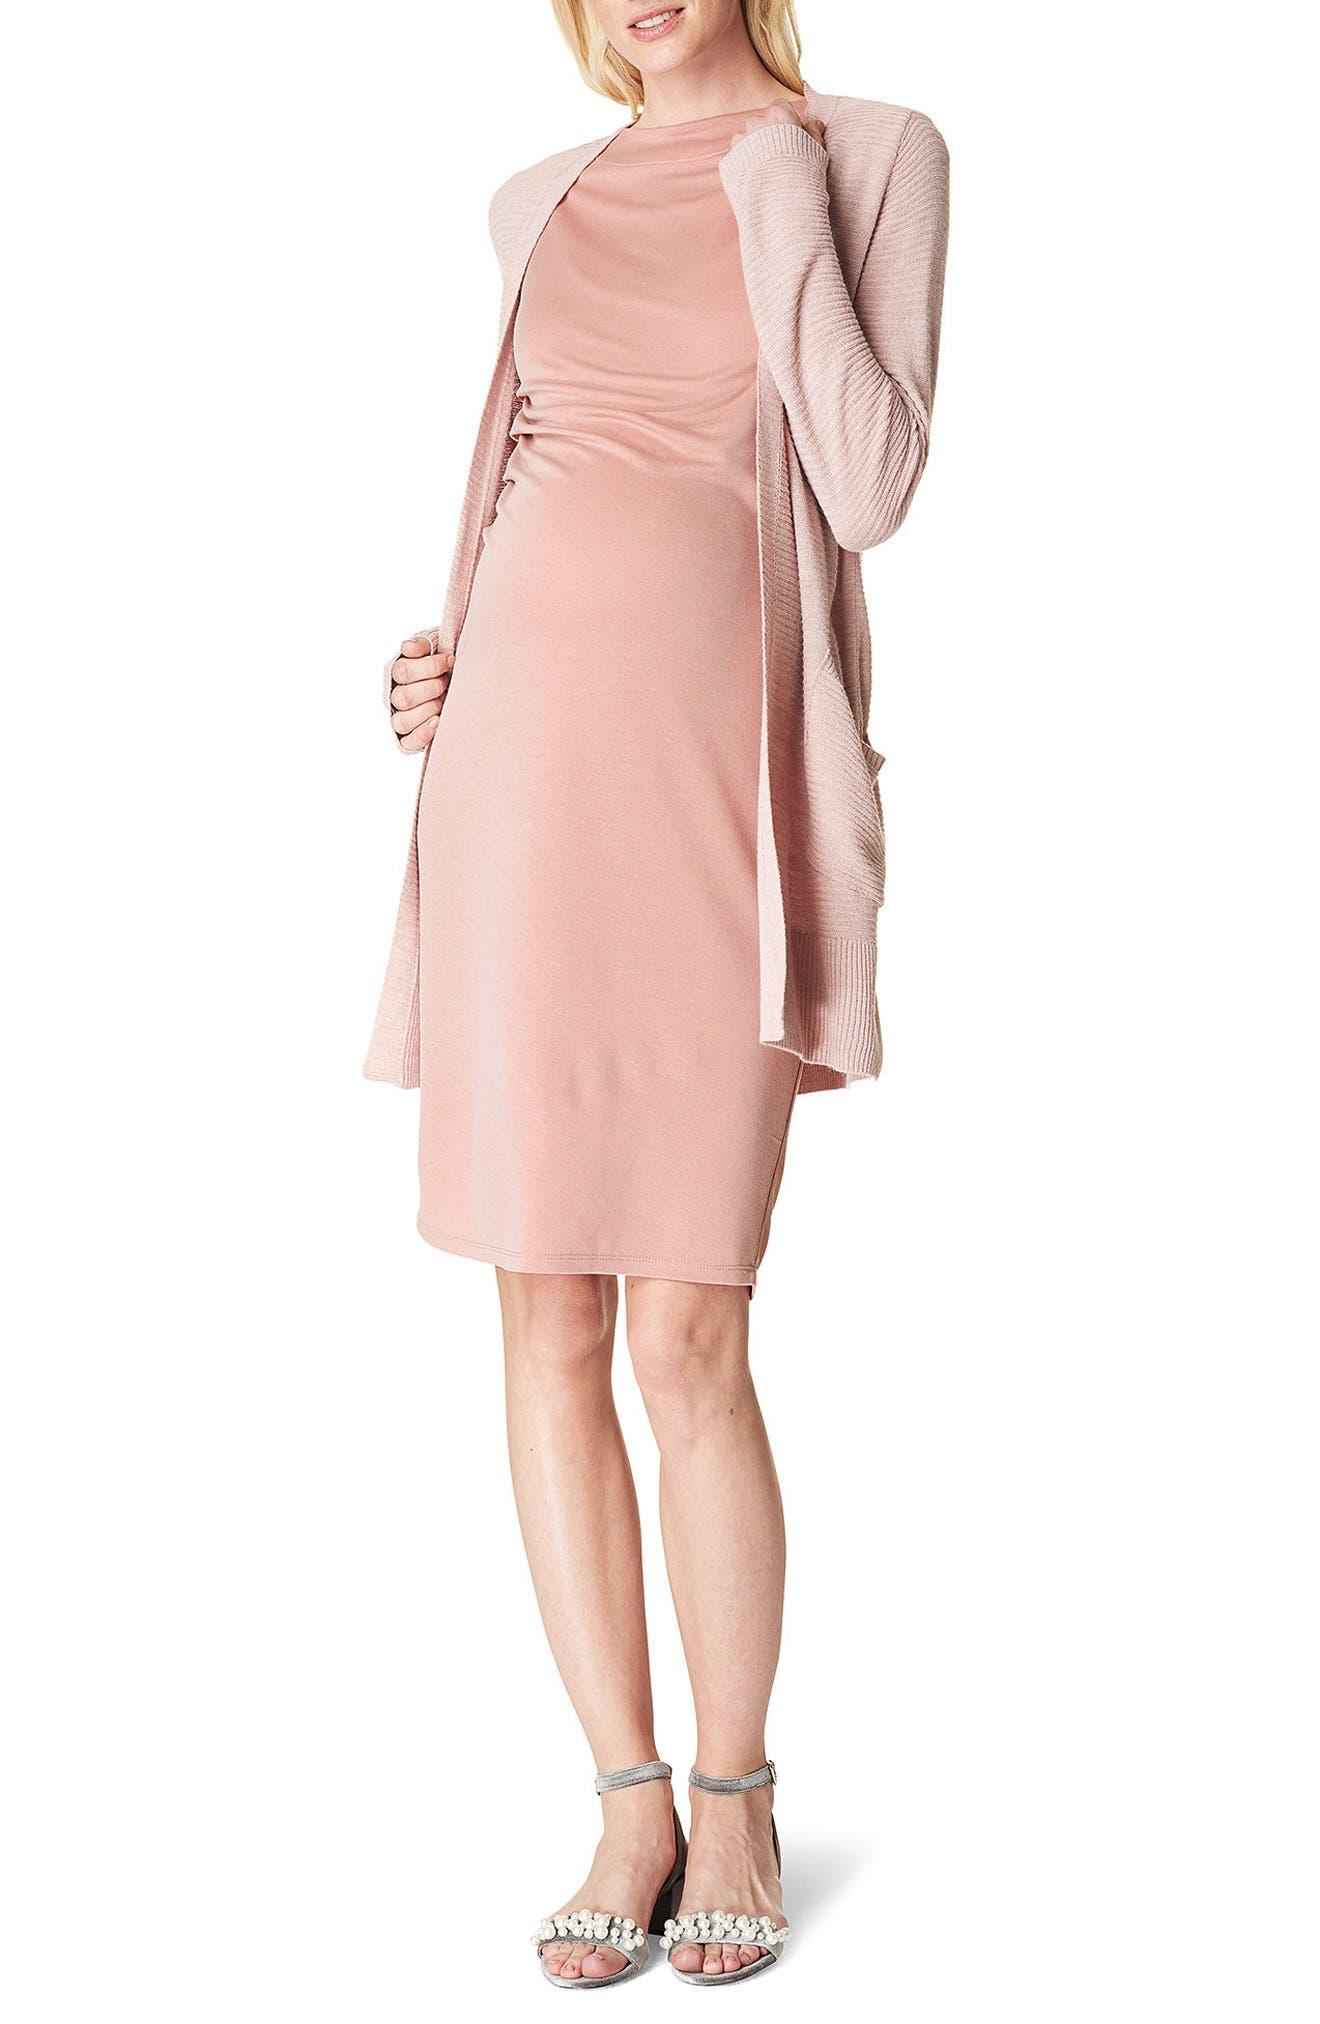 Annefleur Maternity Sheath Dress,                         Main,                         color, Blush